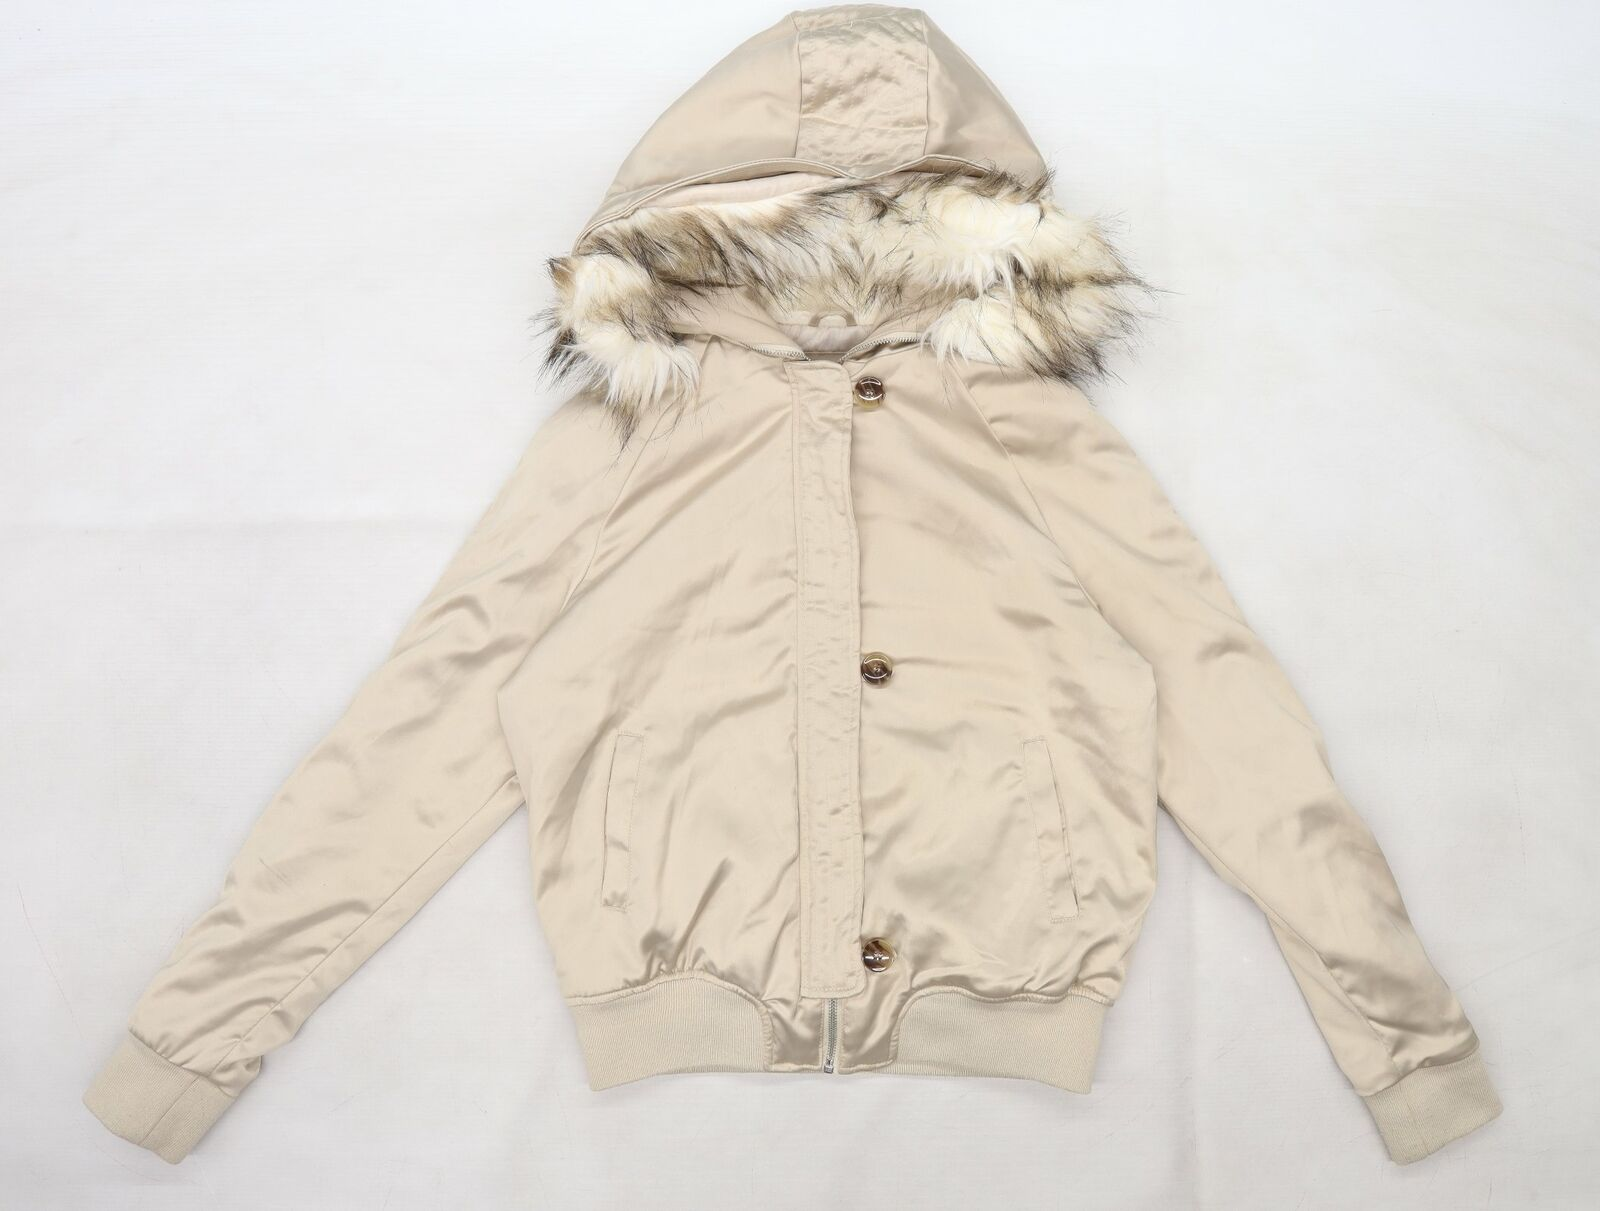 Atmosphere Womens Grey Satin Pea Coat Size 10